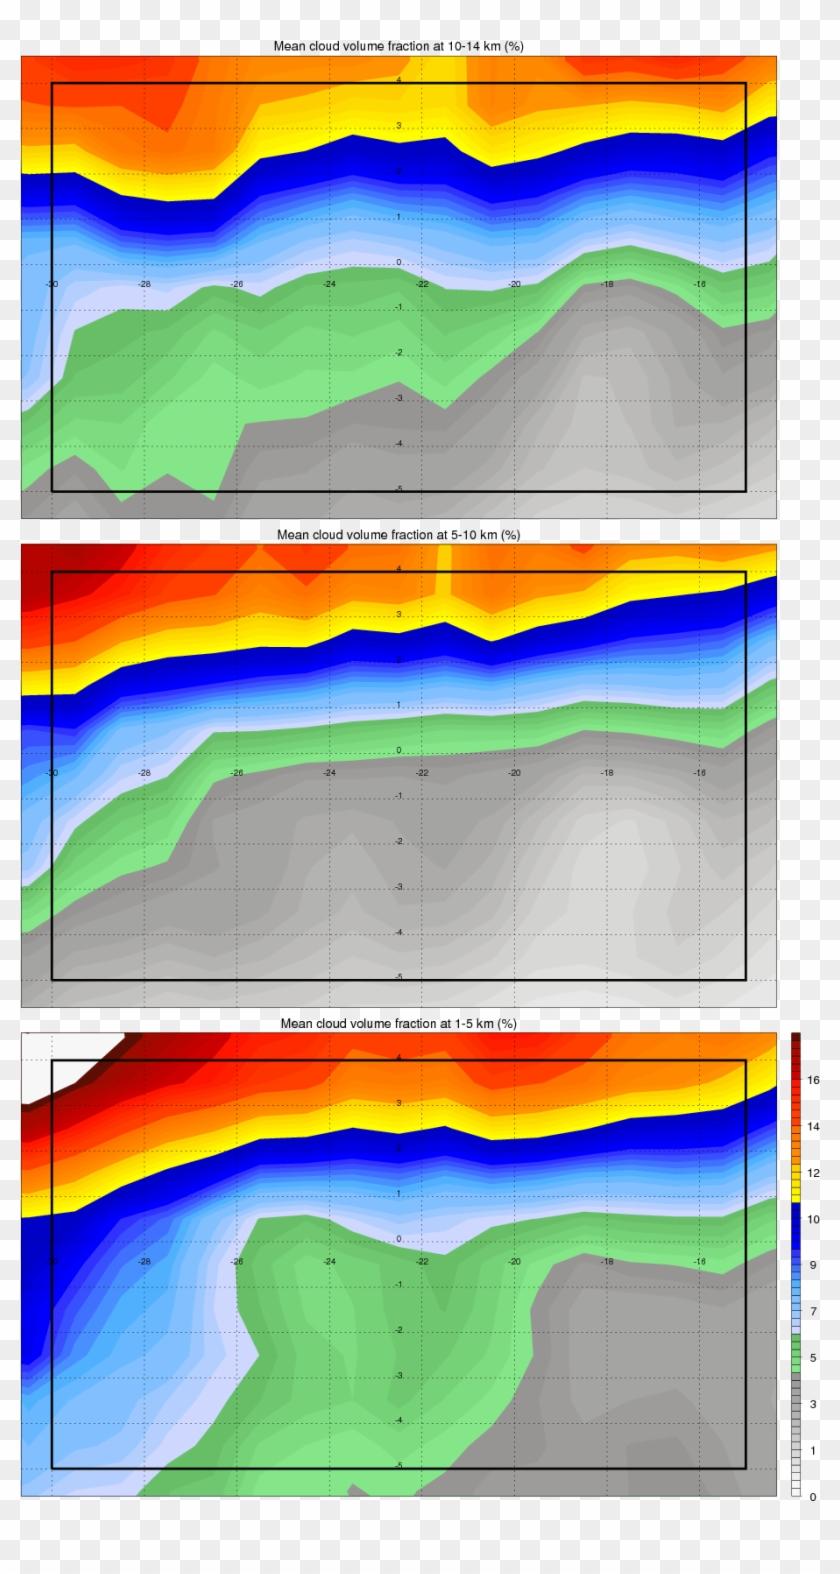 Cloud Seasonal And Diurnal Variation - Graphic Design Clipart #3878019